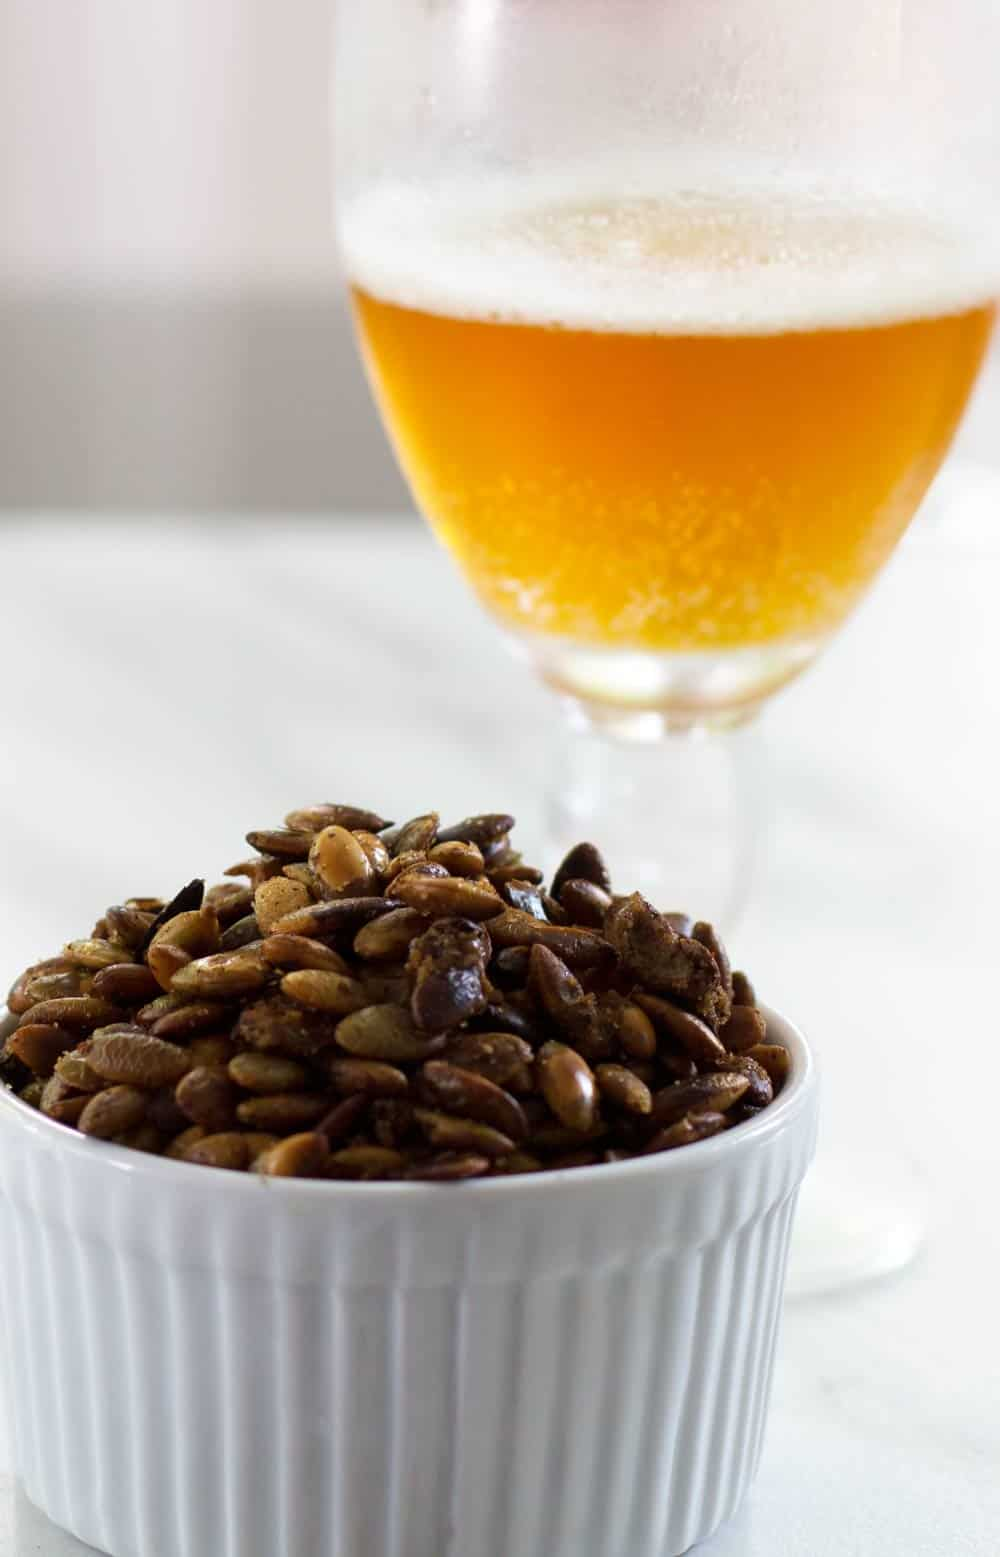 Pepitas in a ramekin with beer